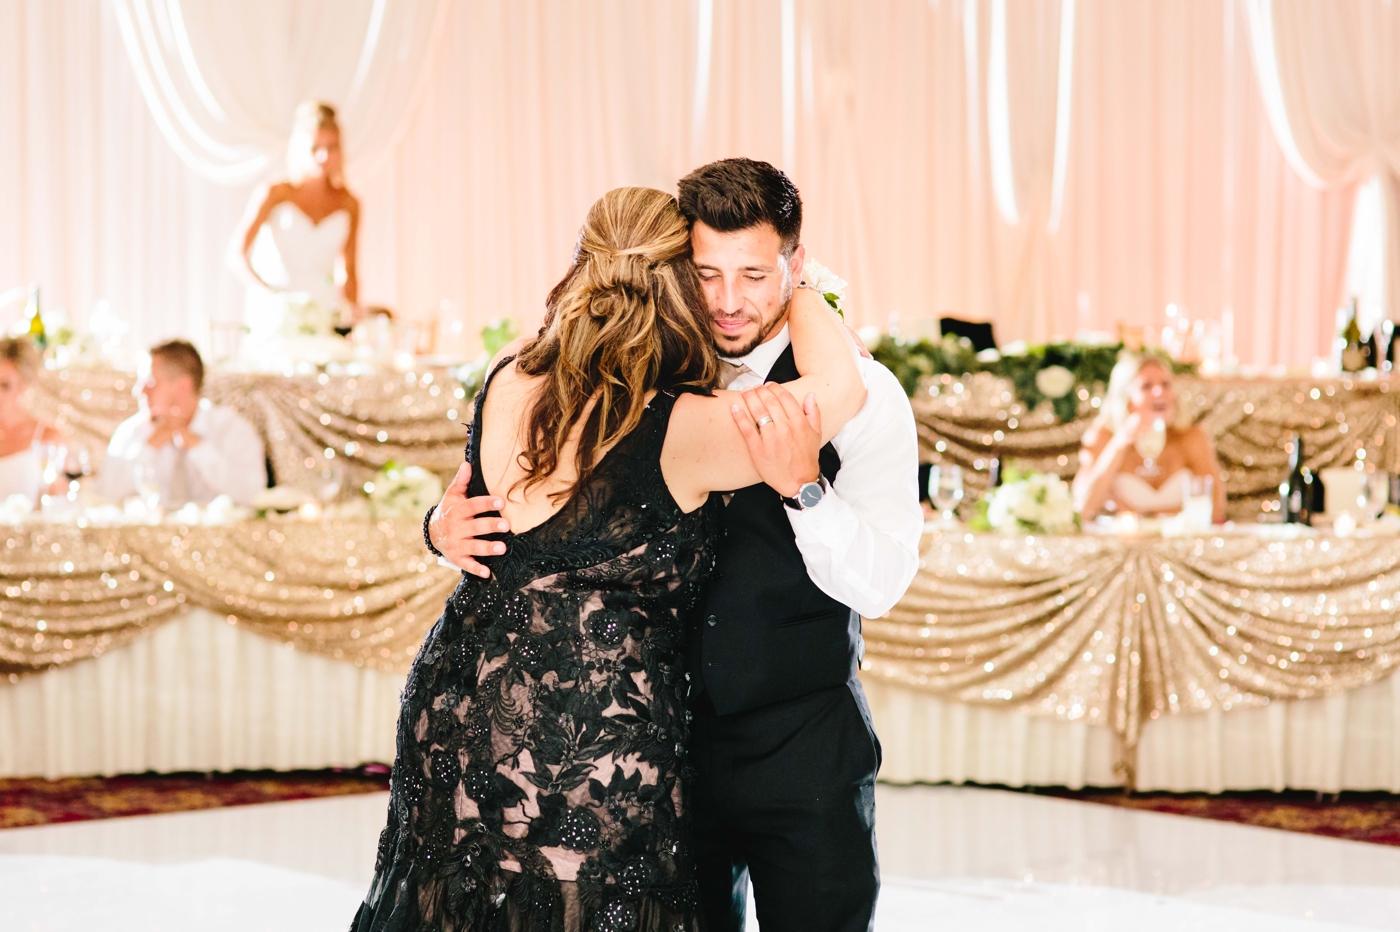 chicago-fine-art-wedding-photography-patano47